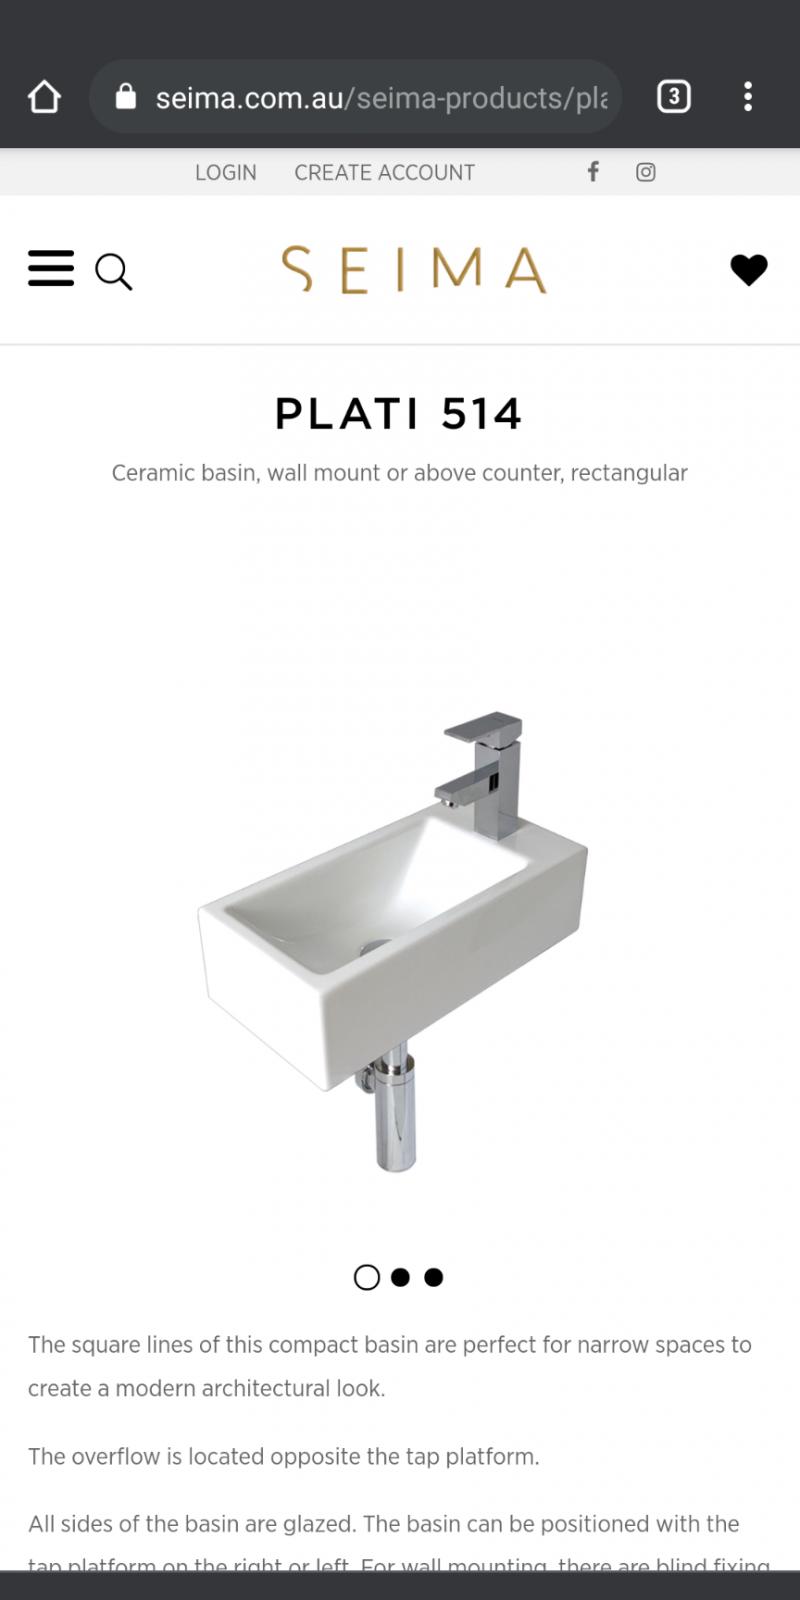 wall hung basin on counter?